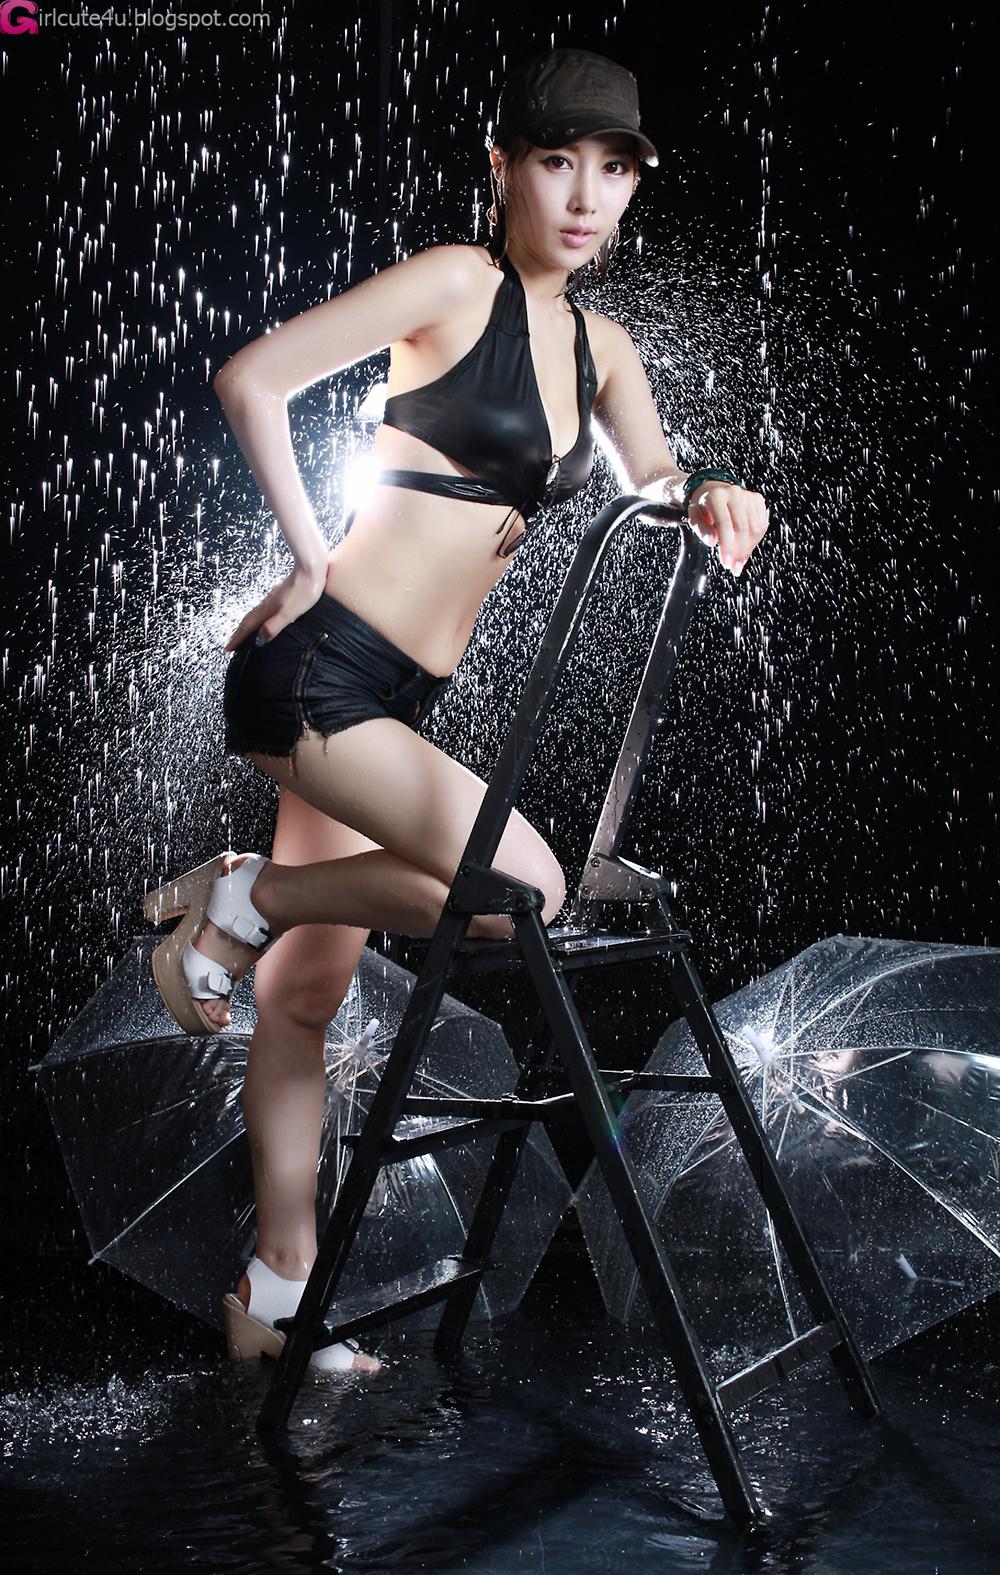 xxx nude girls: Heo Yoon Mi - Korea Speed Festival R3 2012